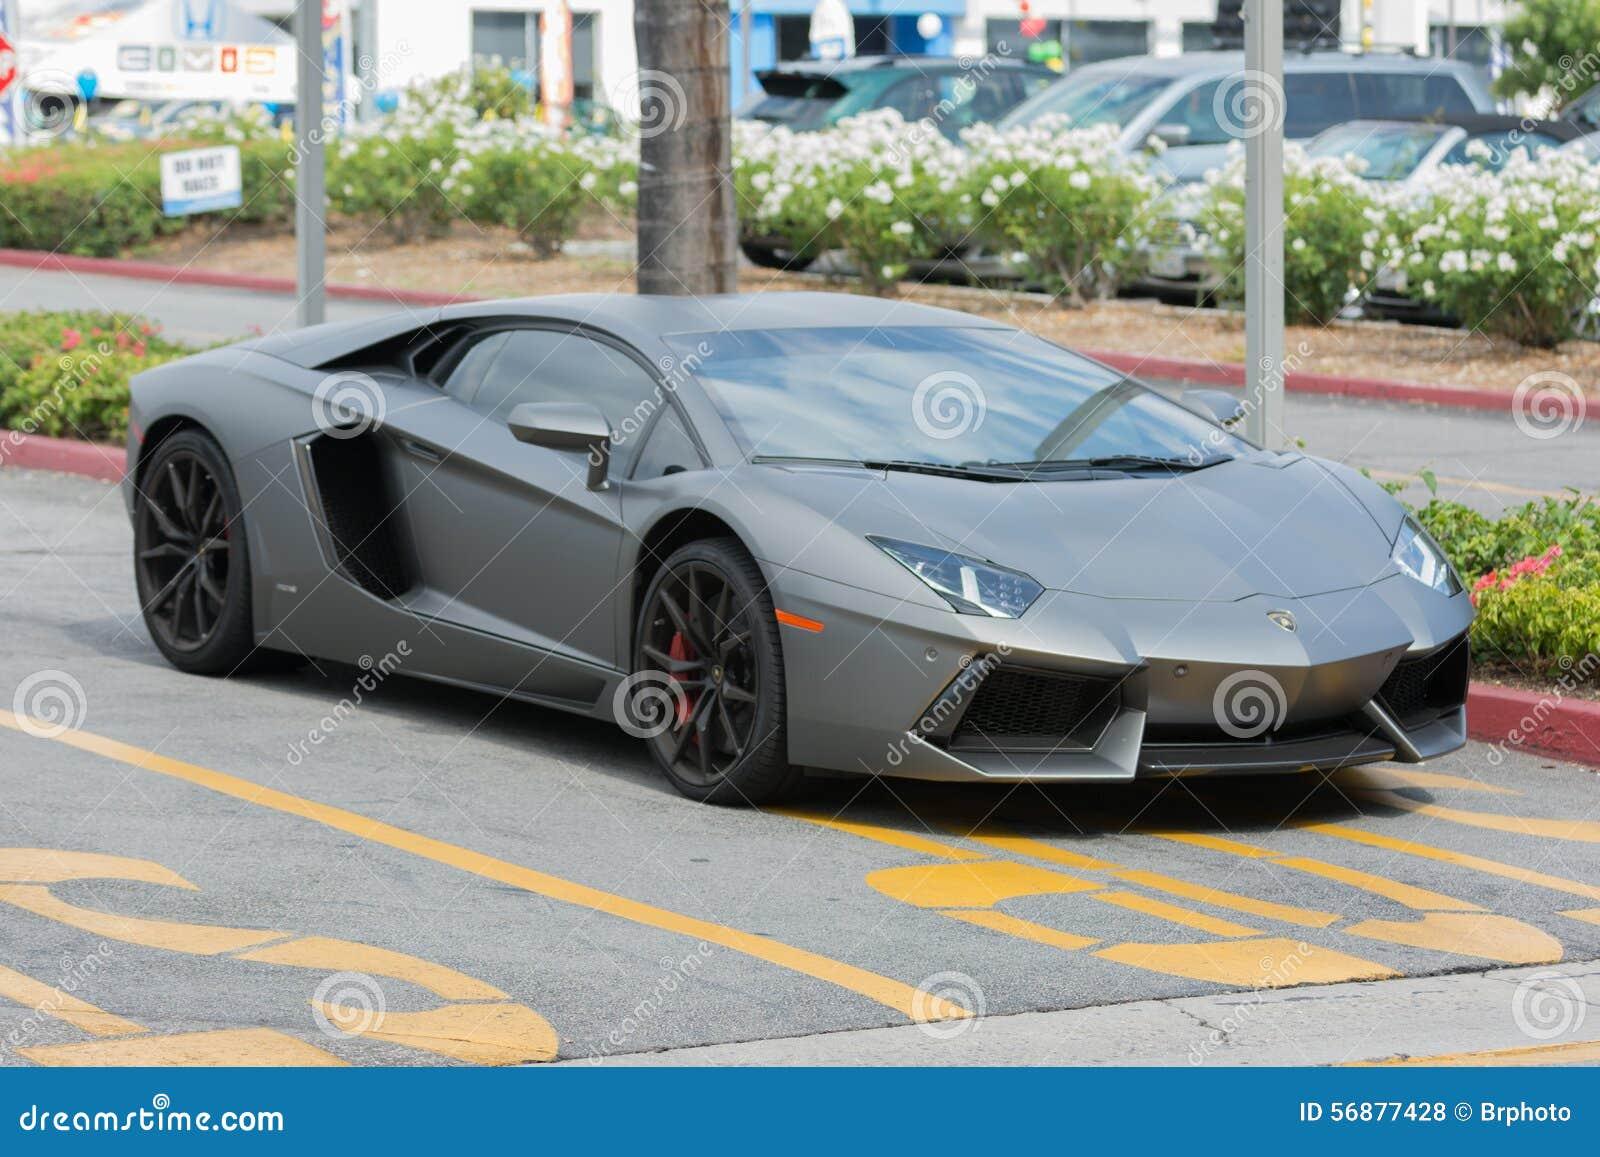 Lamborghini Aventador car on display